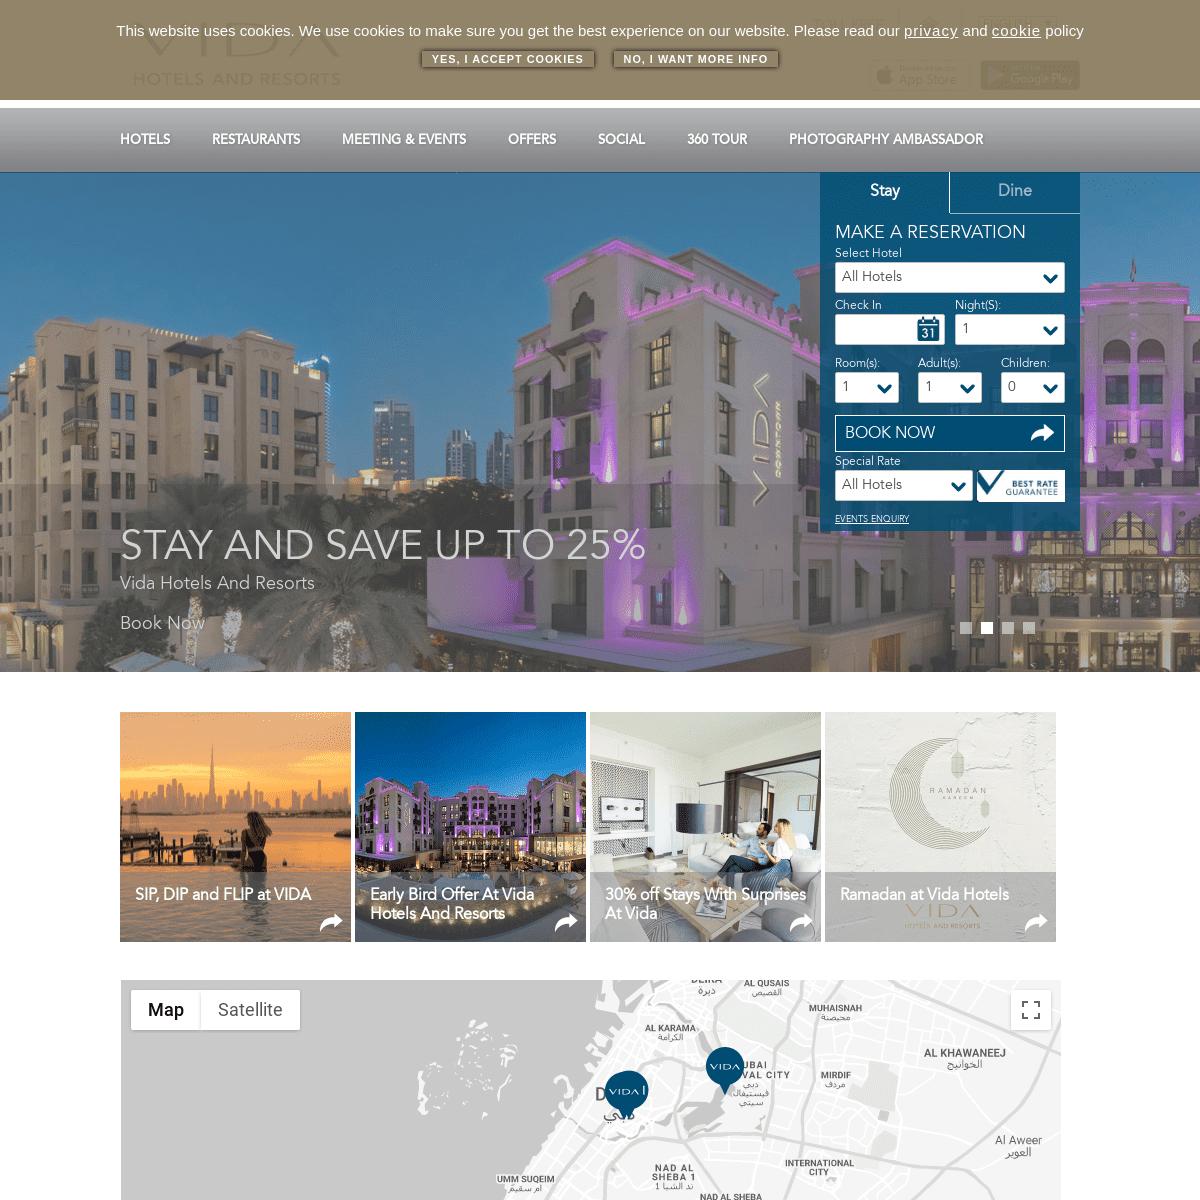 Lifestyle Hotels in Downtown Dubai, Emirates Hills and Dubai Creek Harbour - vidahotels.com